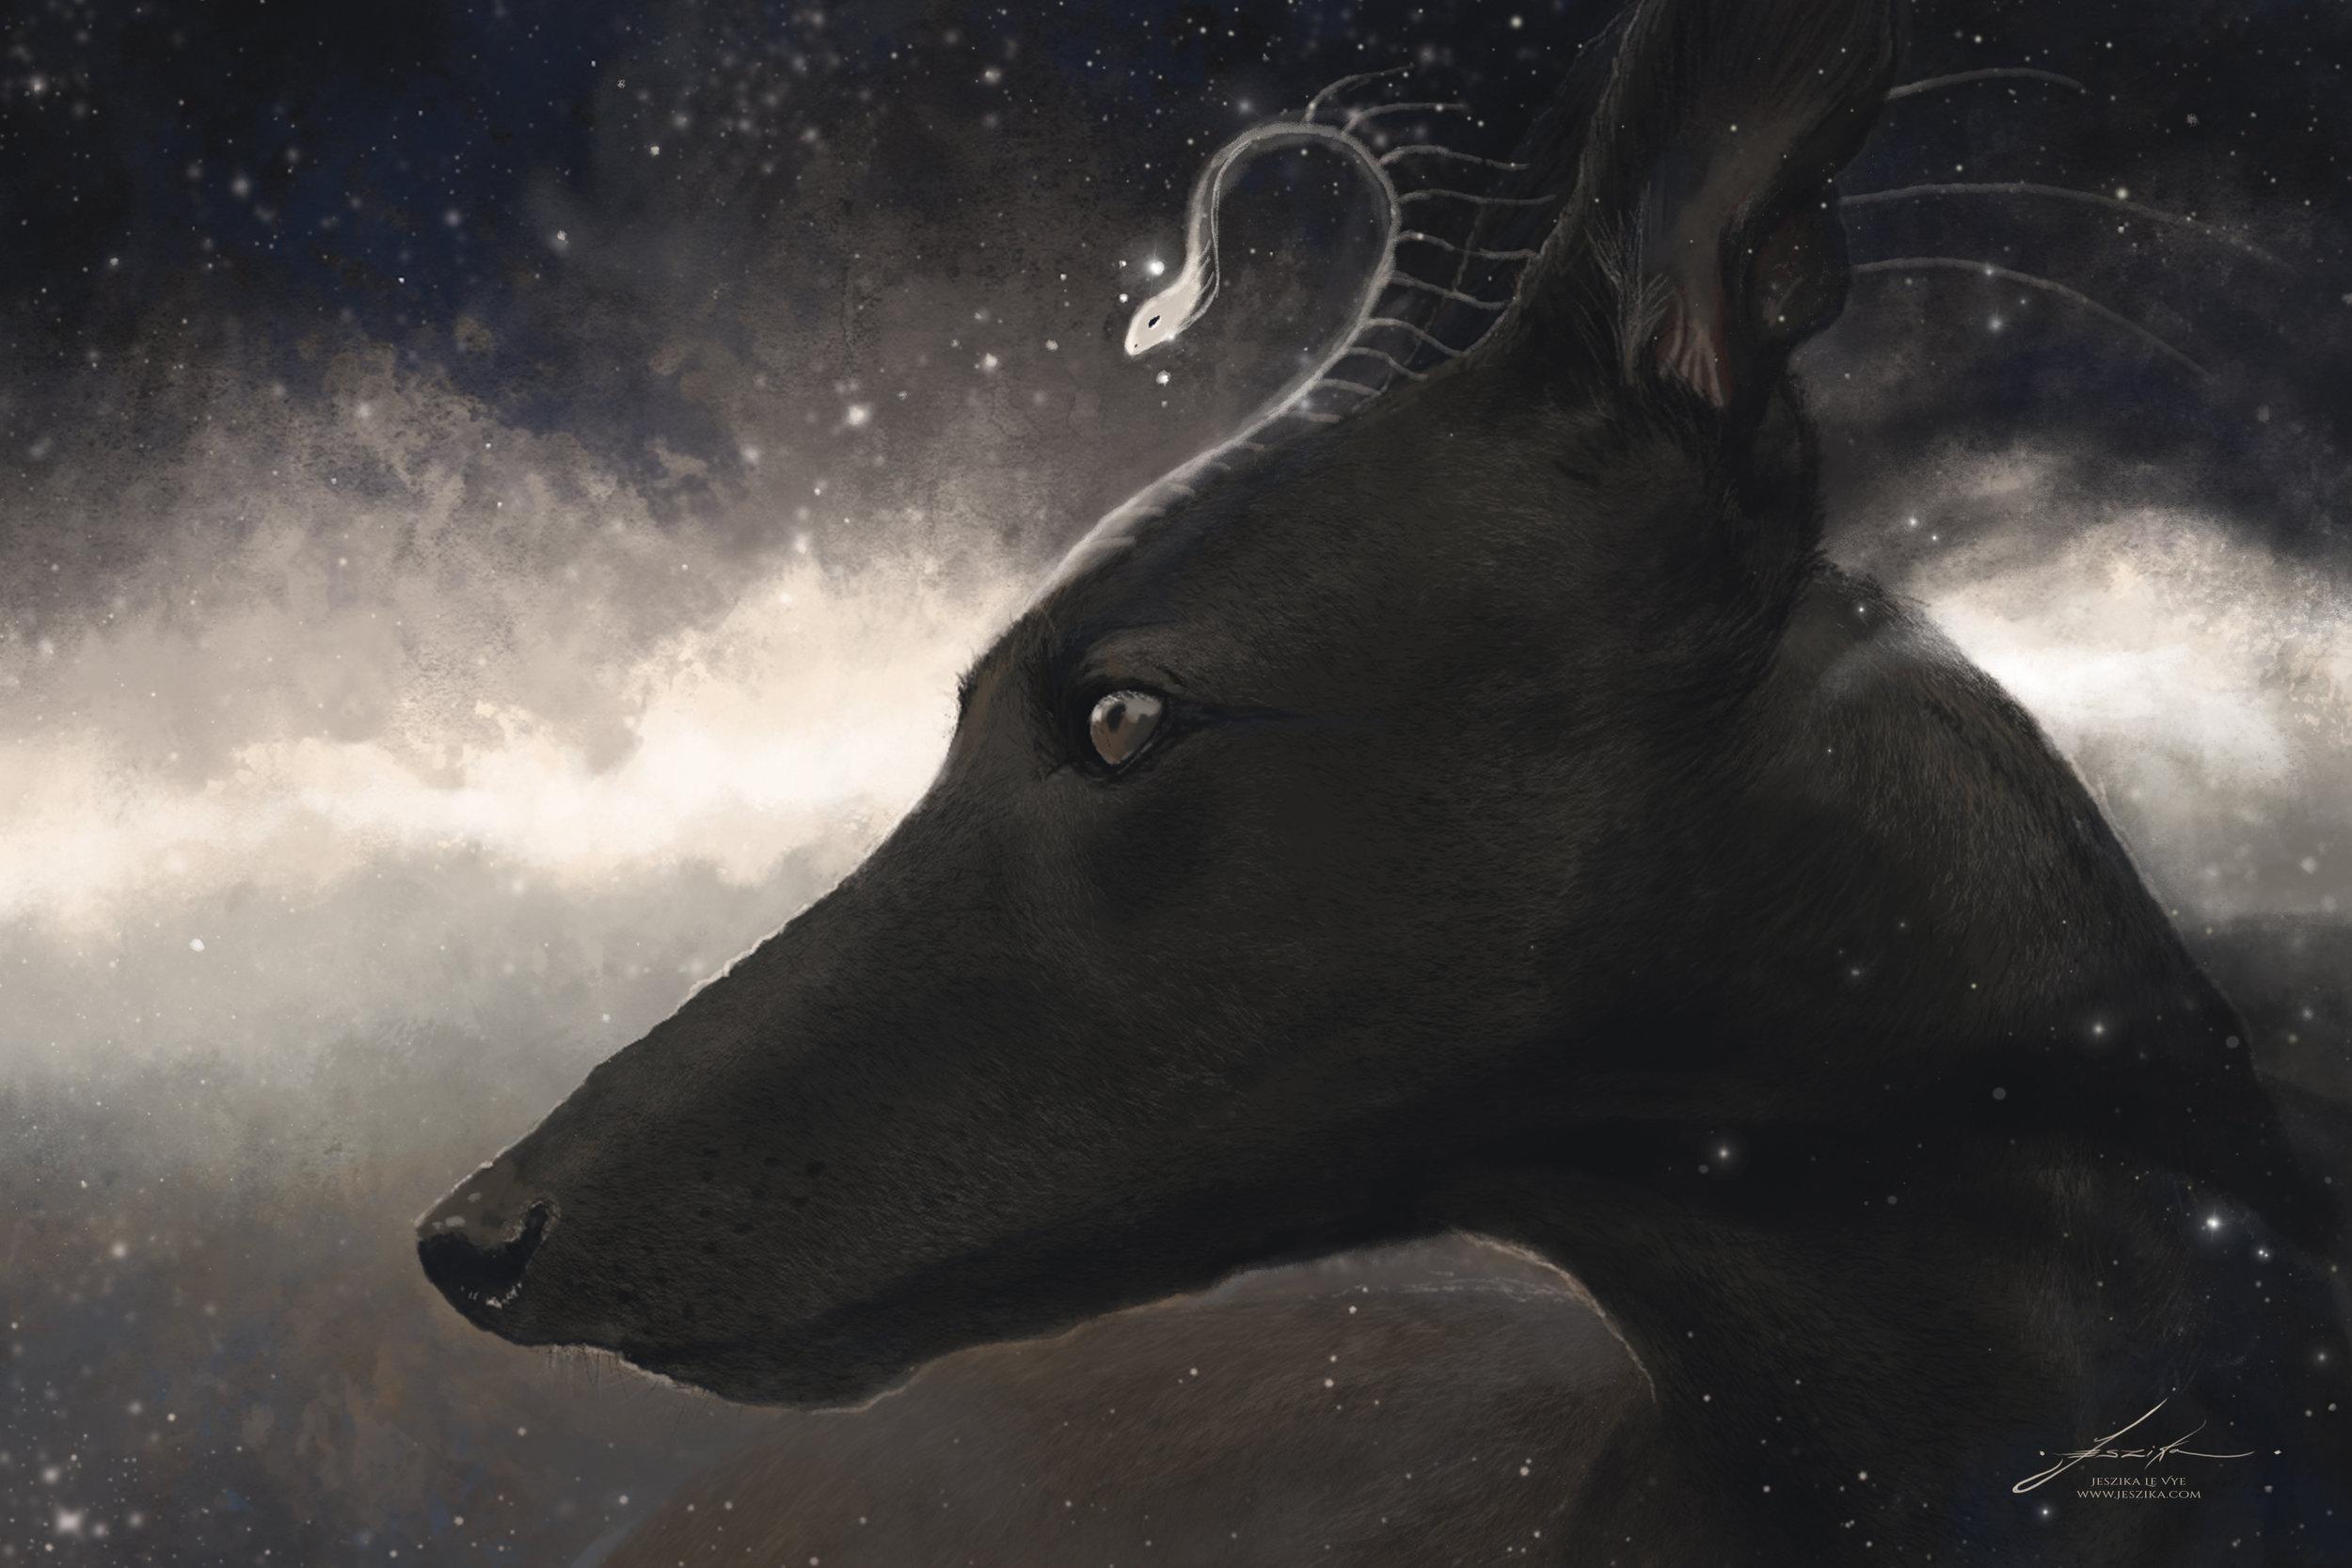 Anubis - Fangs like Stars